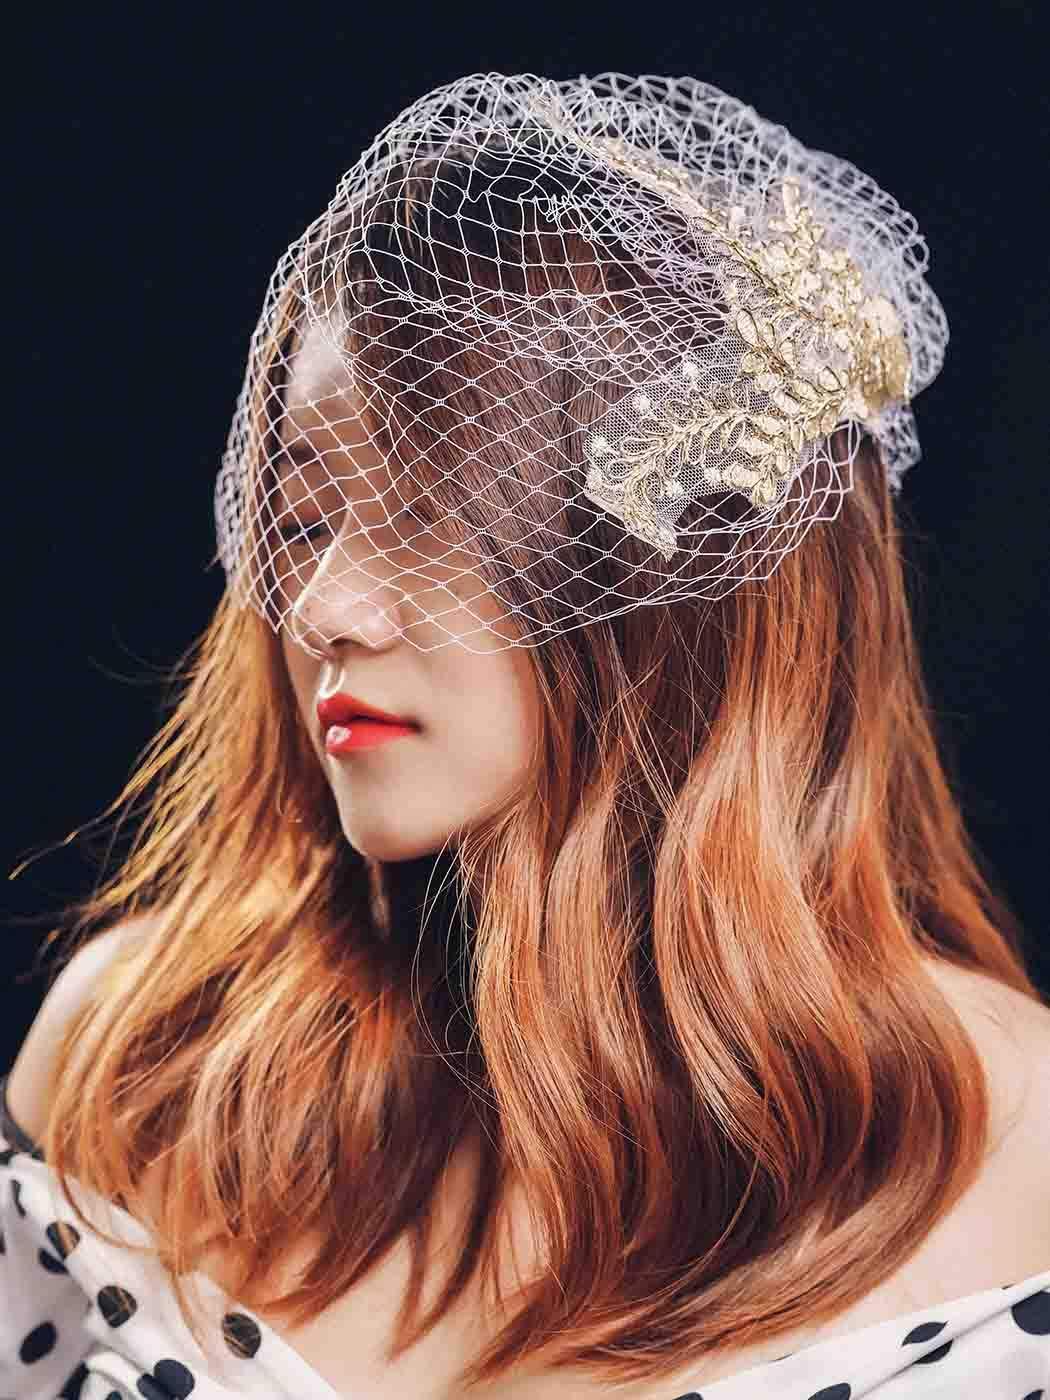 Unsutuo Birdcage Veils Bride Wedding Applique V Cheap SALE Inventory cleanup selling sale Start Lace Veil Bridal